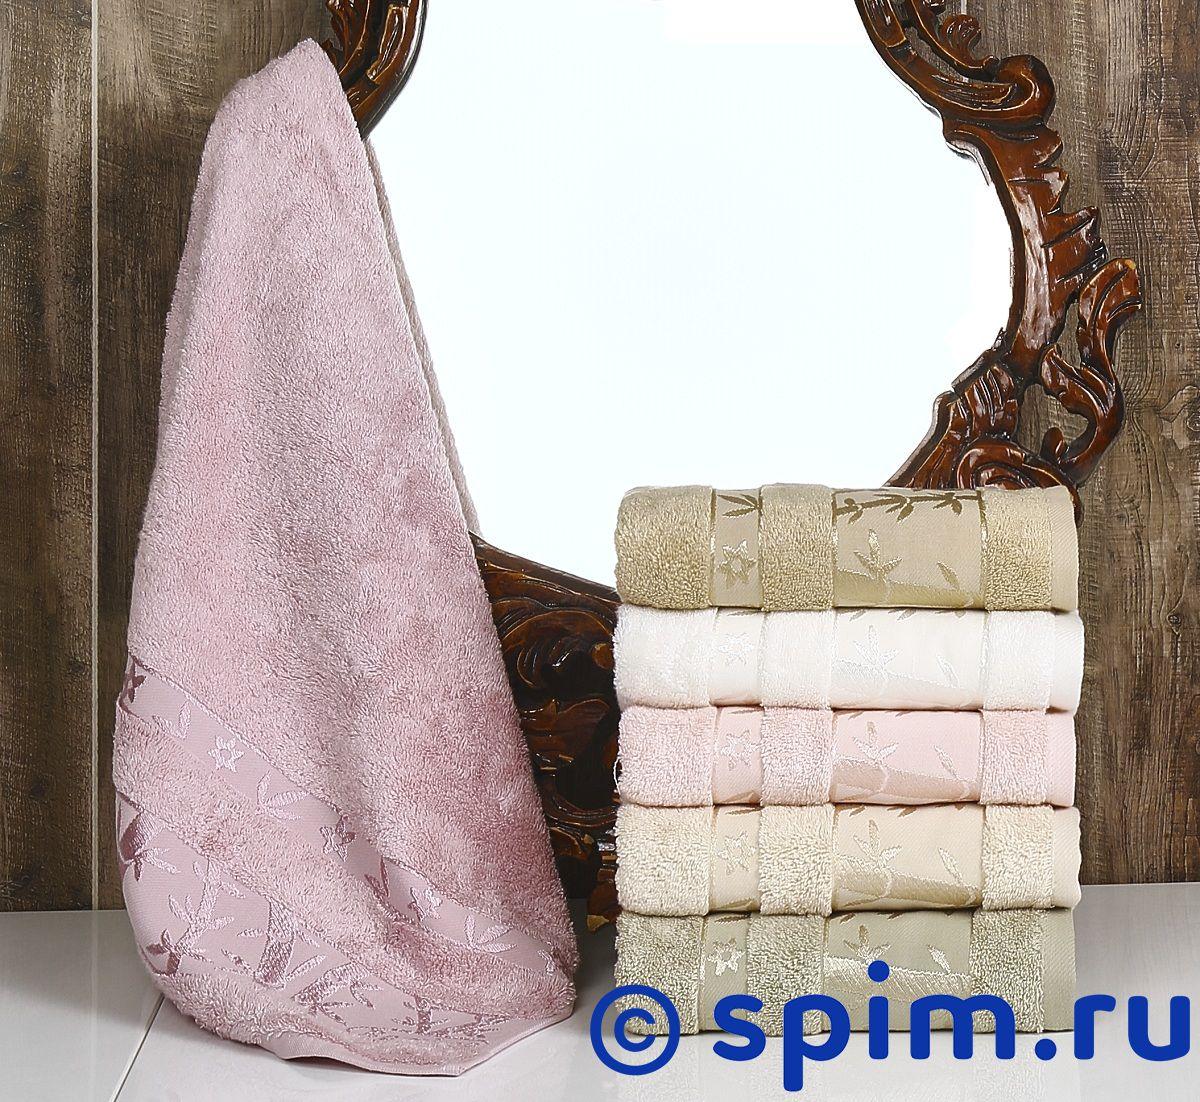 Набор полотенец Pupilla Elit Soft 50х90 см фиолетовый kvadrro м 50х90 70х130 в коробке набор полотенец фиеста